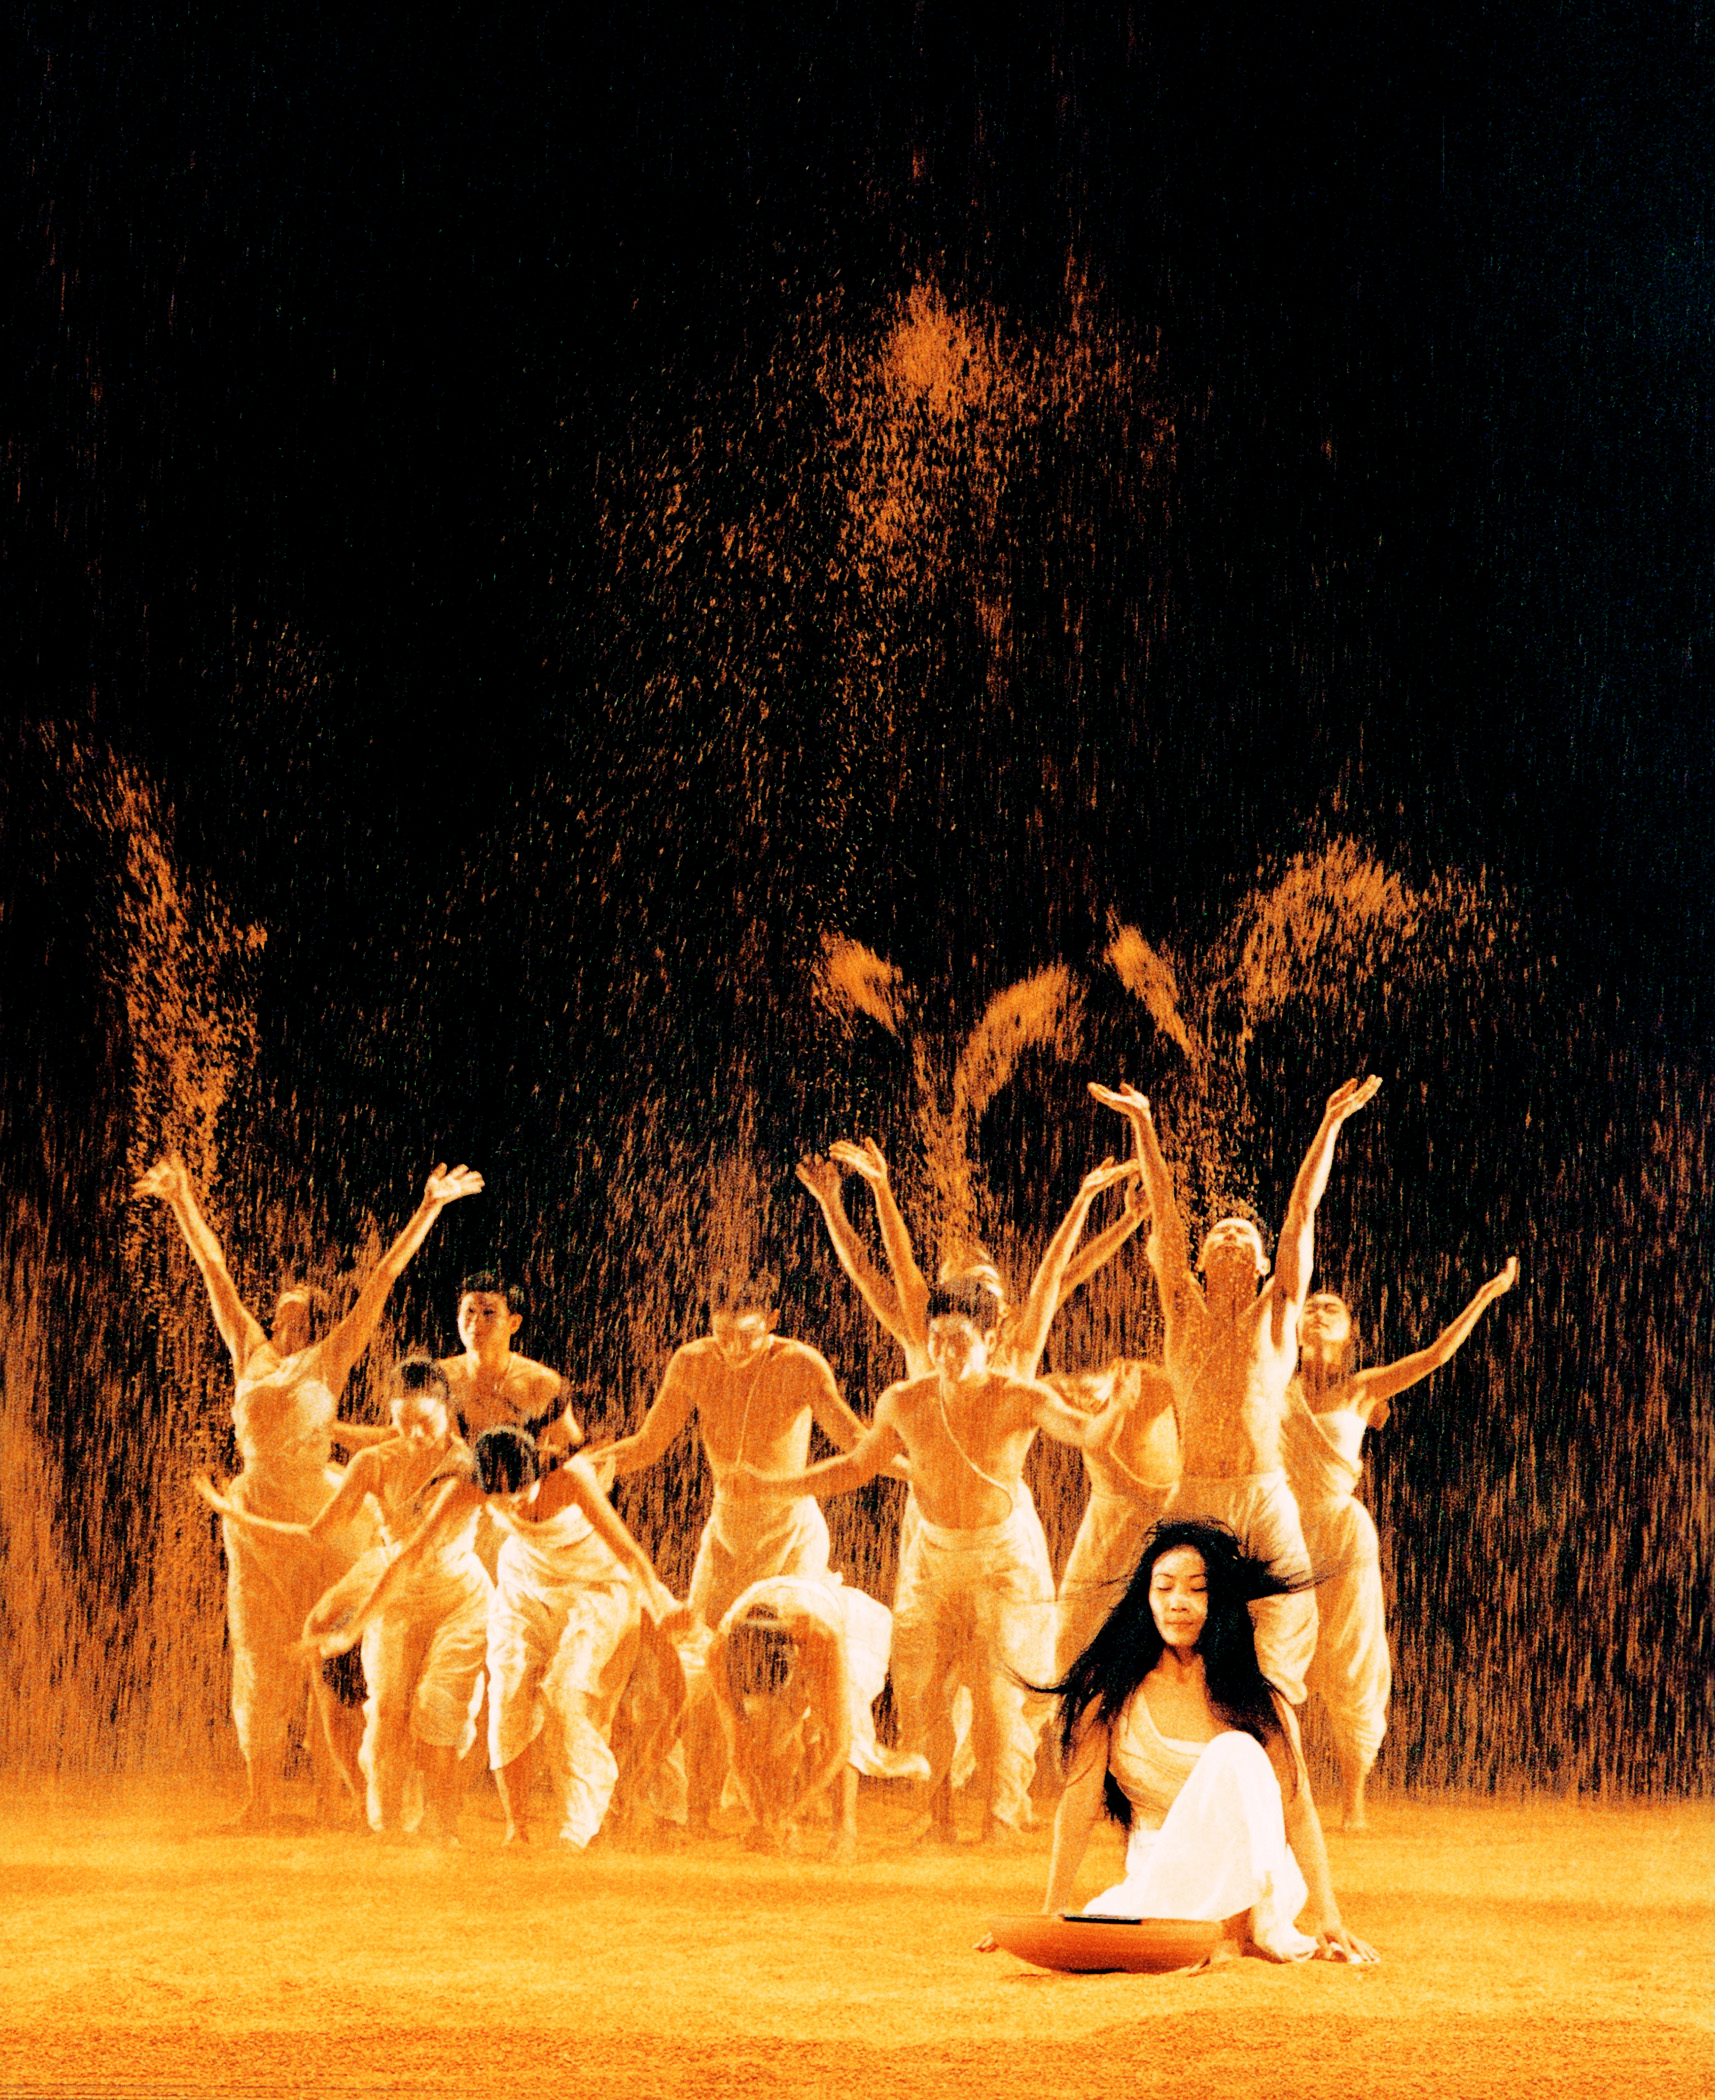 Songs of the Wanderers_Cloud Gate Dance Theatre of Taiwan_Photo by YU Hui-hung 5.jpg